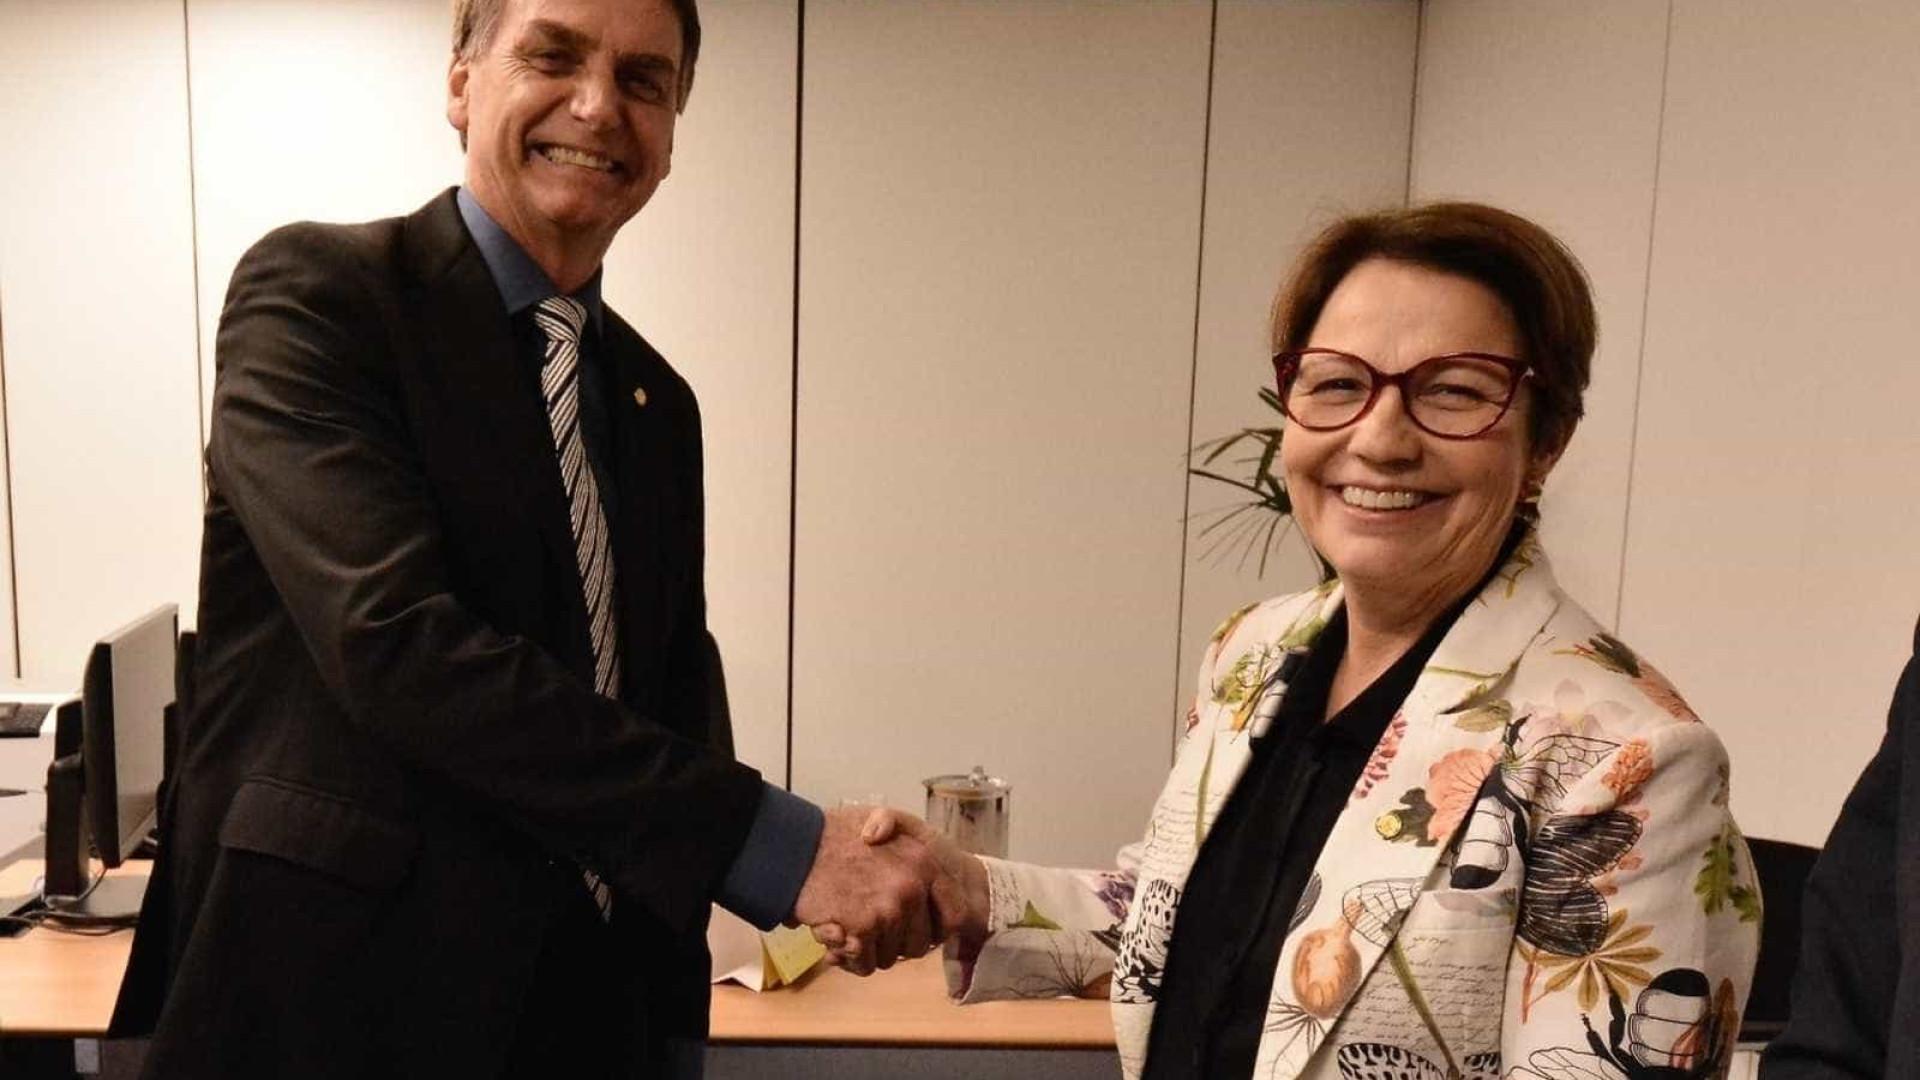 Futura ministra de Bolsonaro dará espaço para debate sobre agrotóxicos